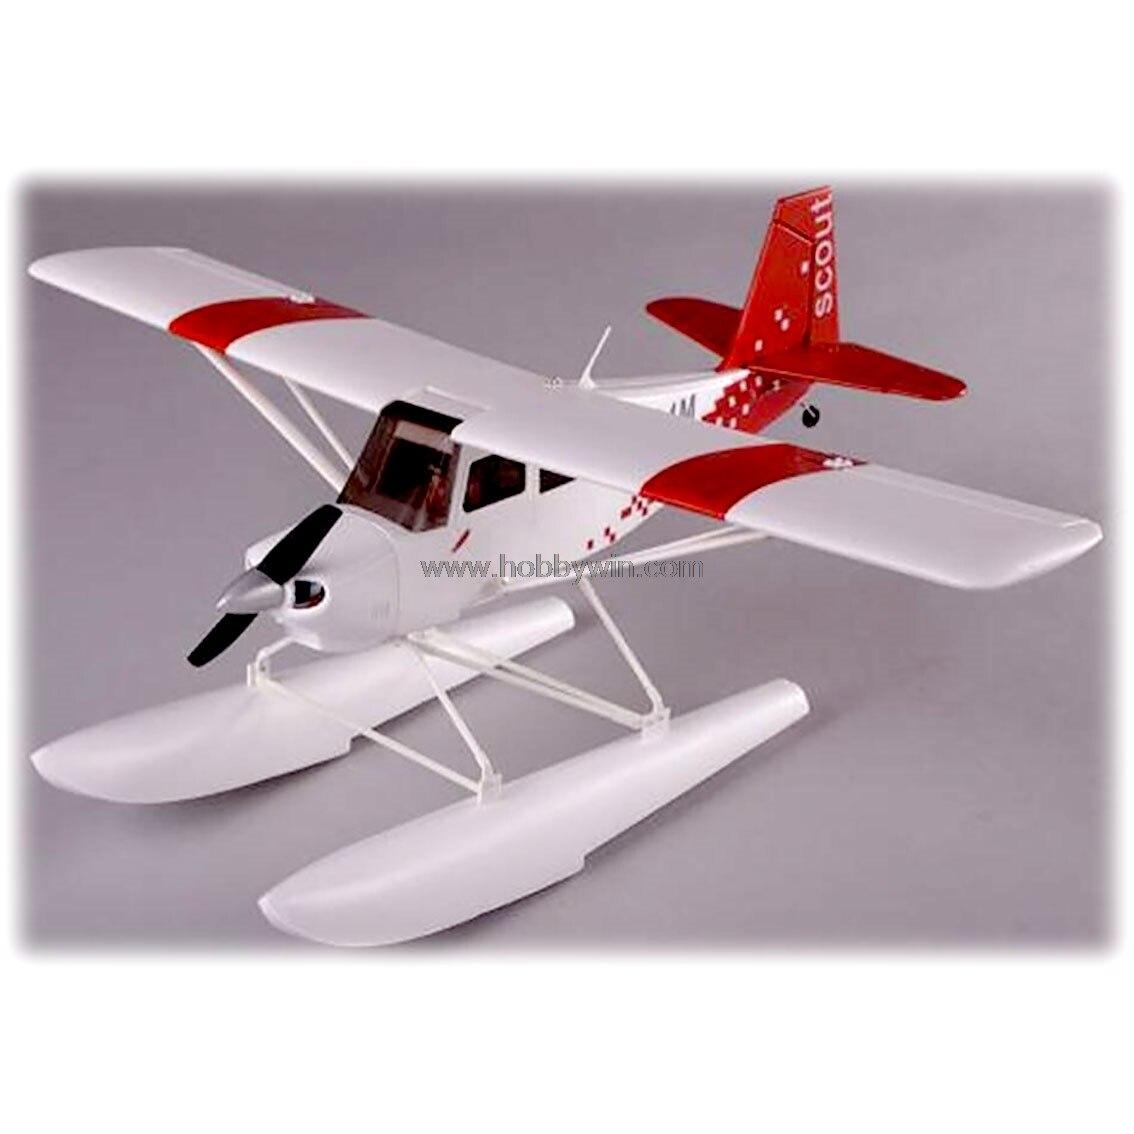 8GCBC Scout EPS 680mm Amphibious model plane PNP no Battery & Radio contain Landing gear & Water float ls8 18 sailplane eps 2000mm pnp without battery